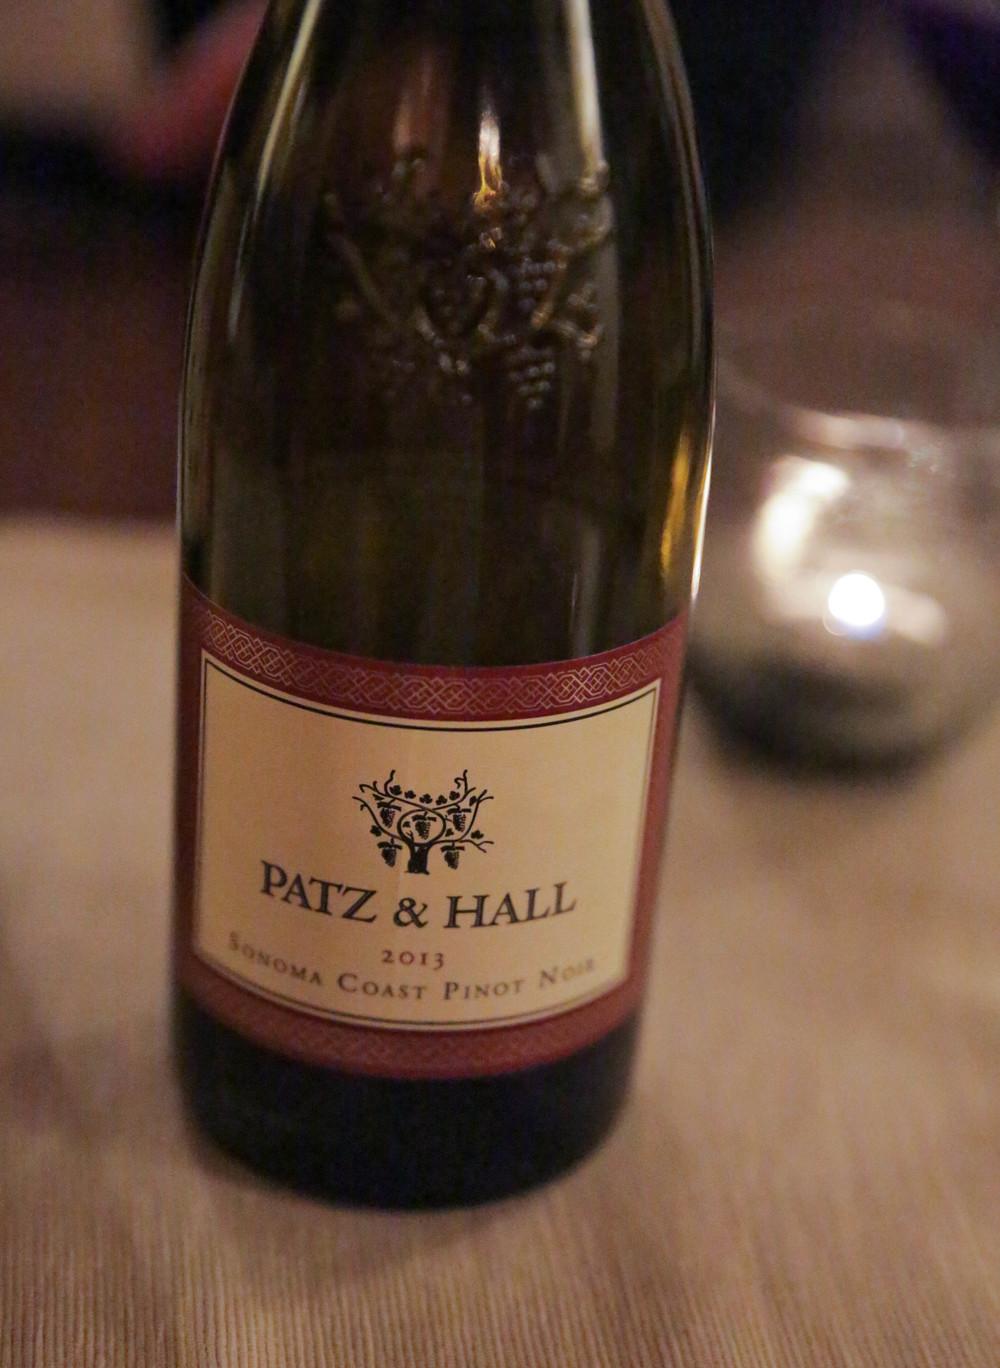 LaurenSchwaiger-Life-Style-Blog-Patz-Hall-Pinot-Noir.jpg